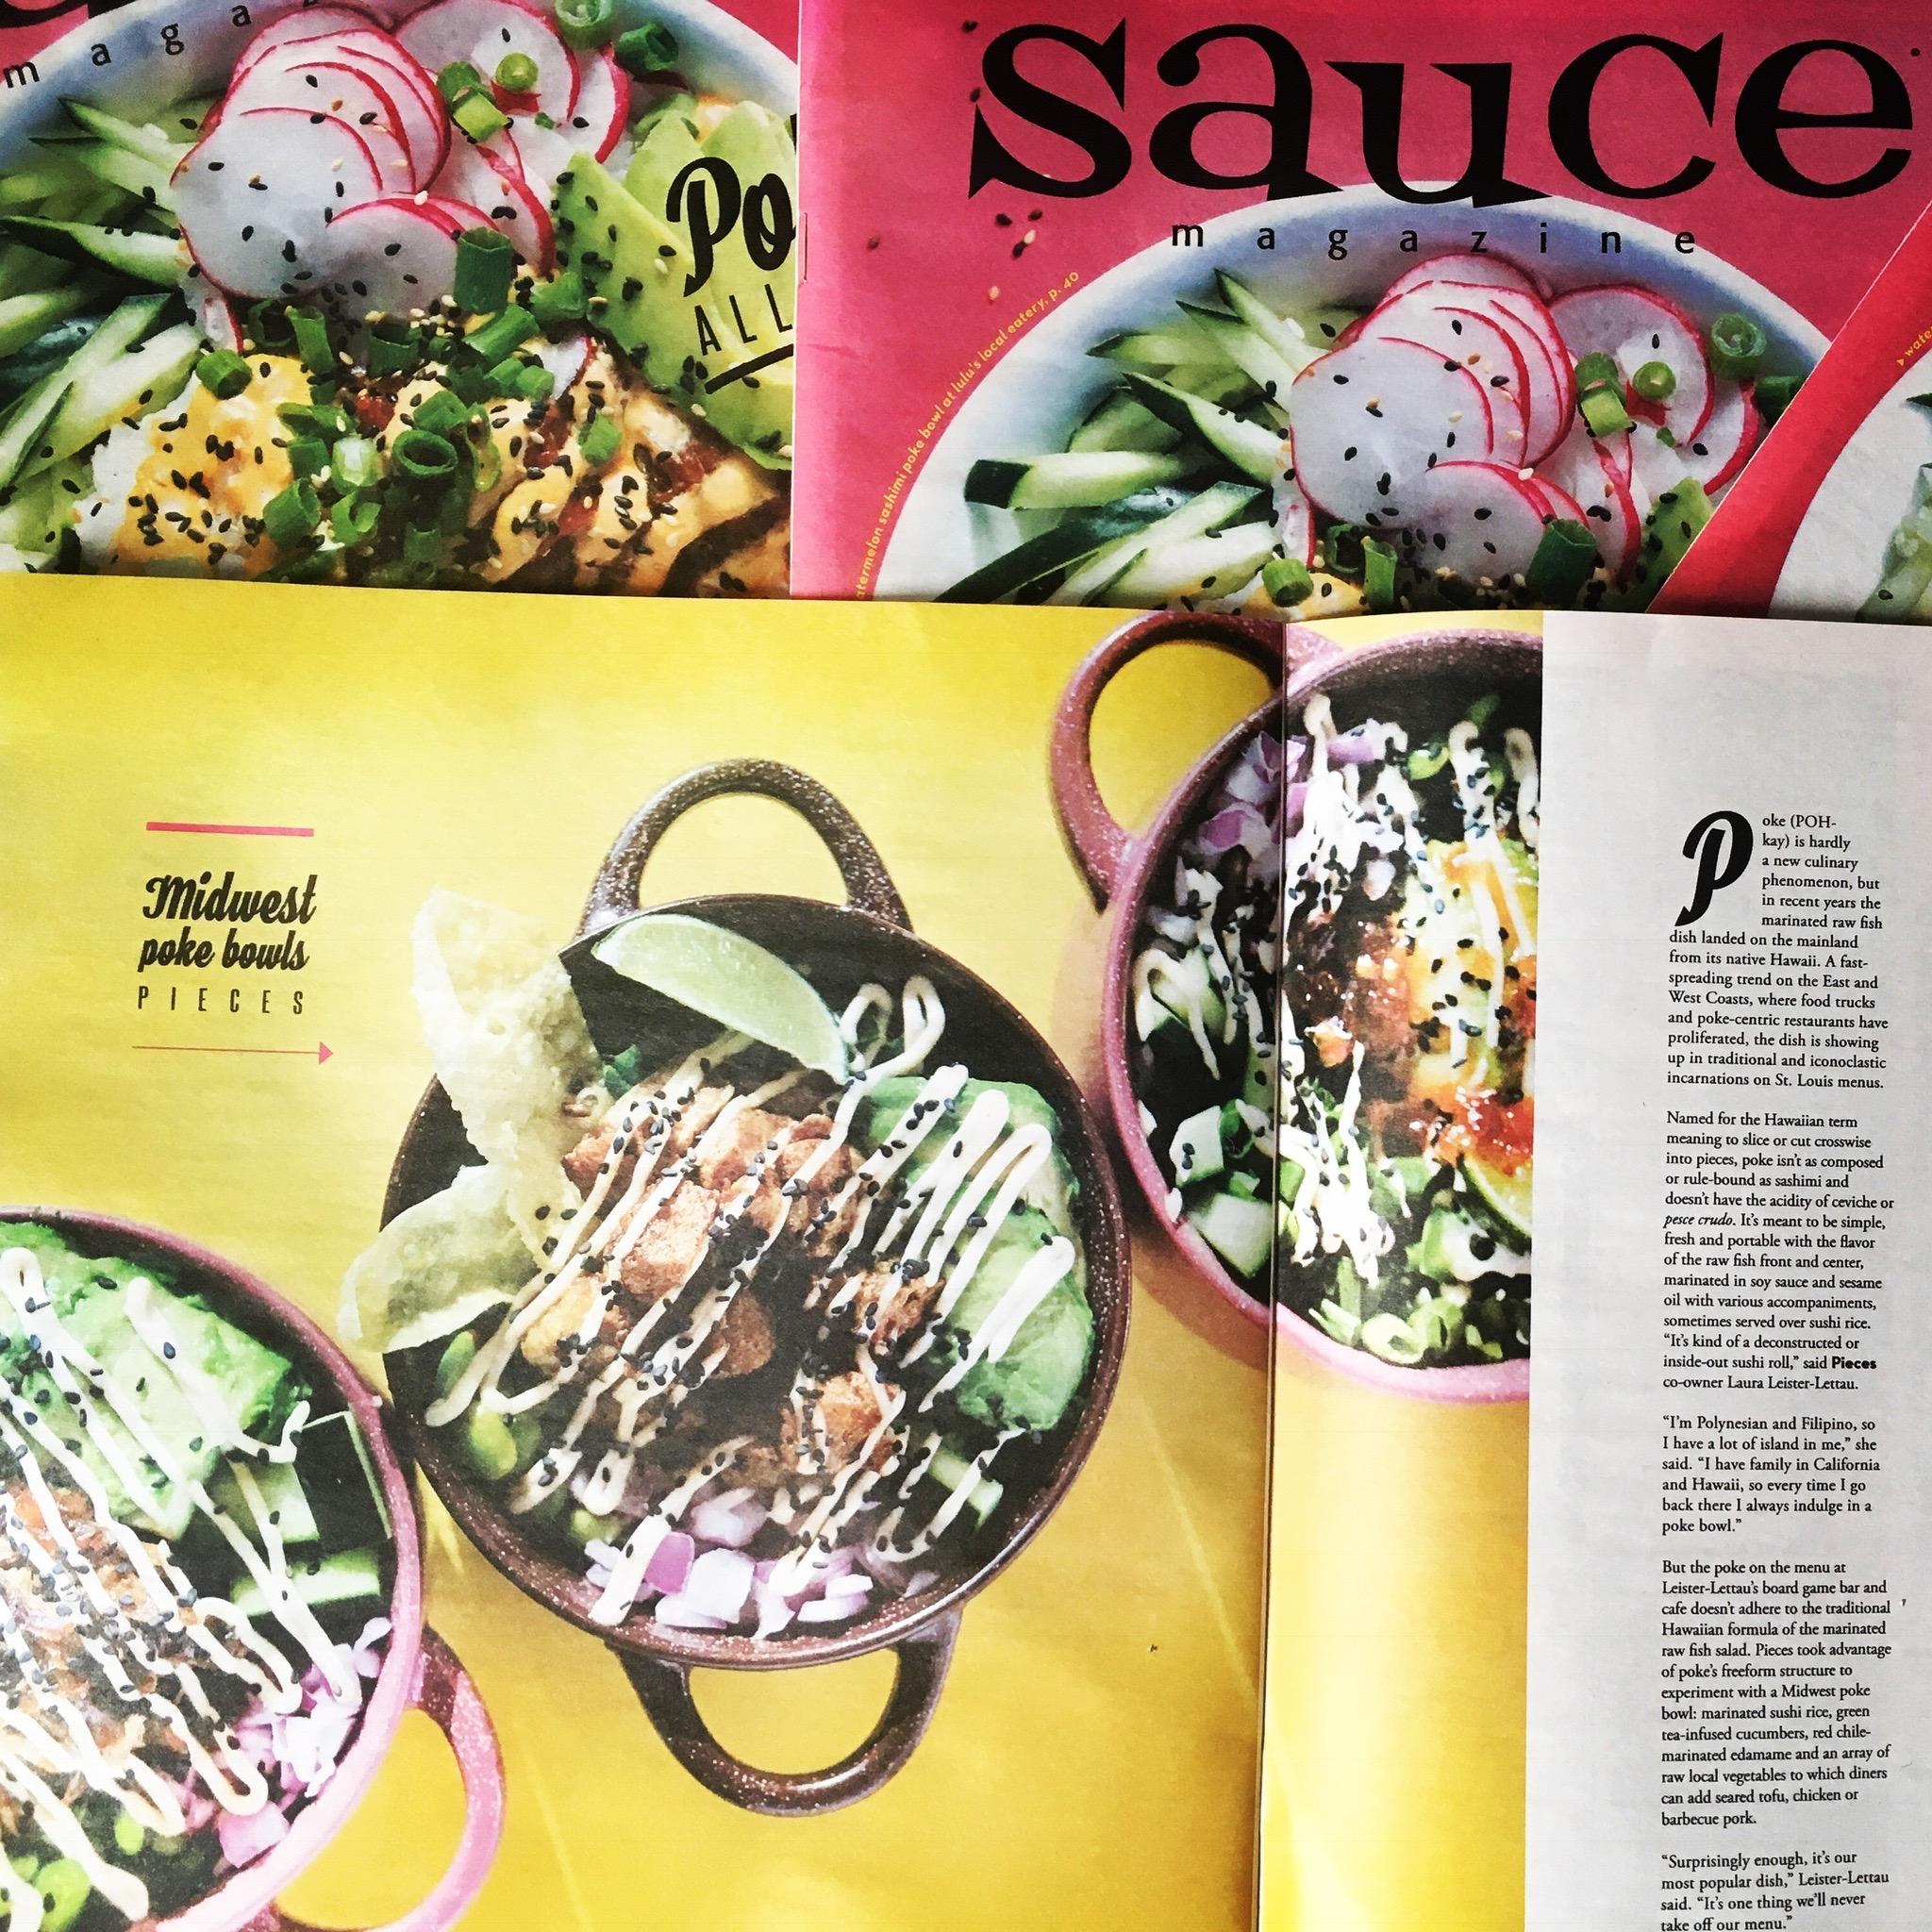 Centerfold in Sauce Magazine